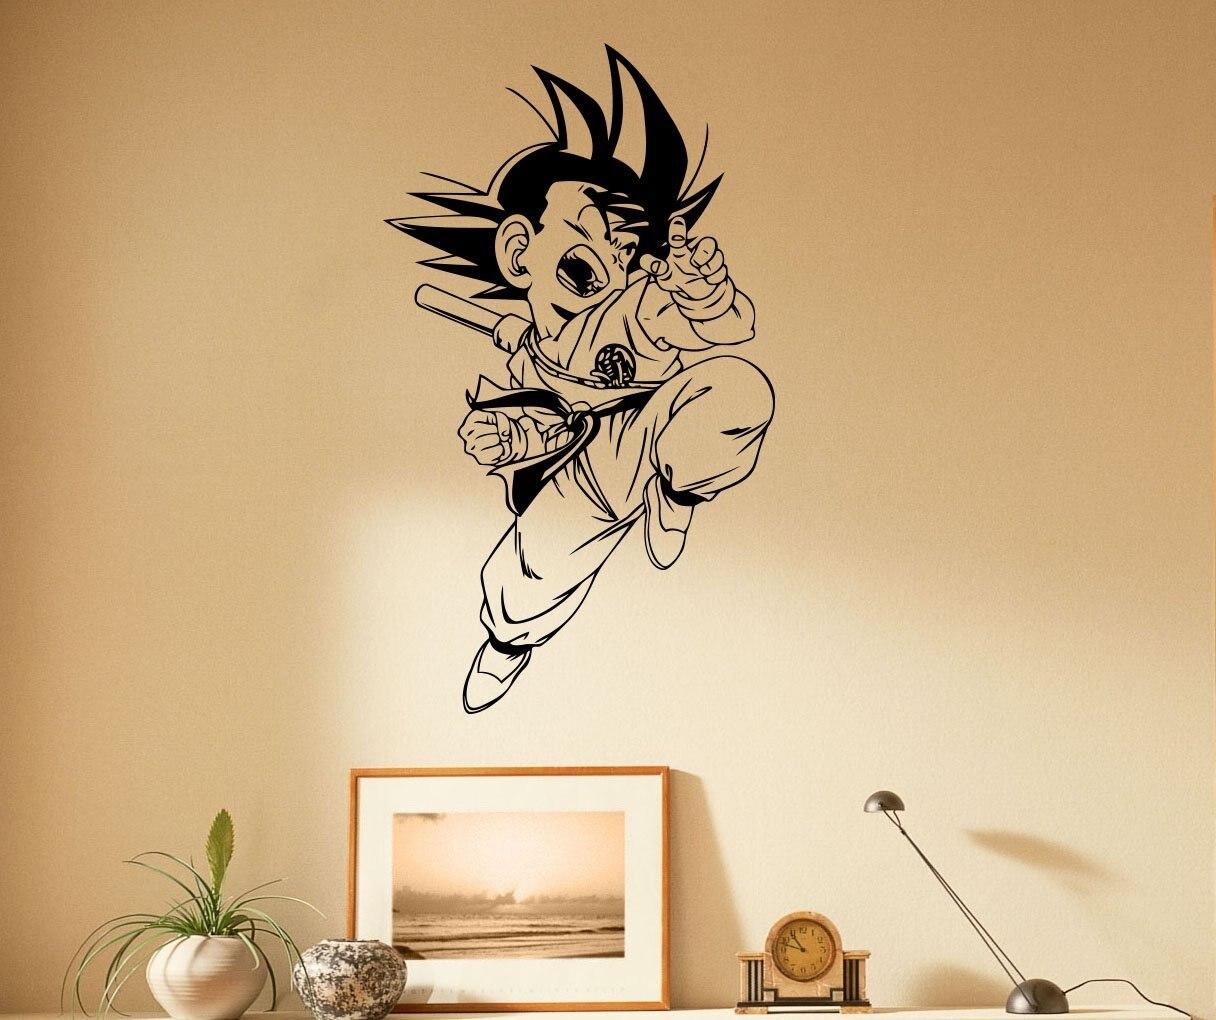 Anime Wall Art japanese wall art mural reviews - online shopping japanese wall